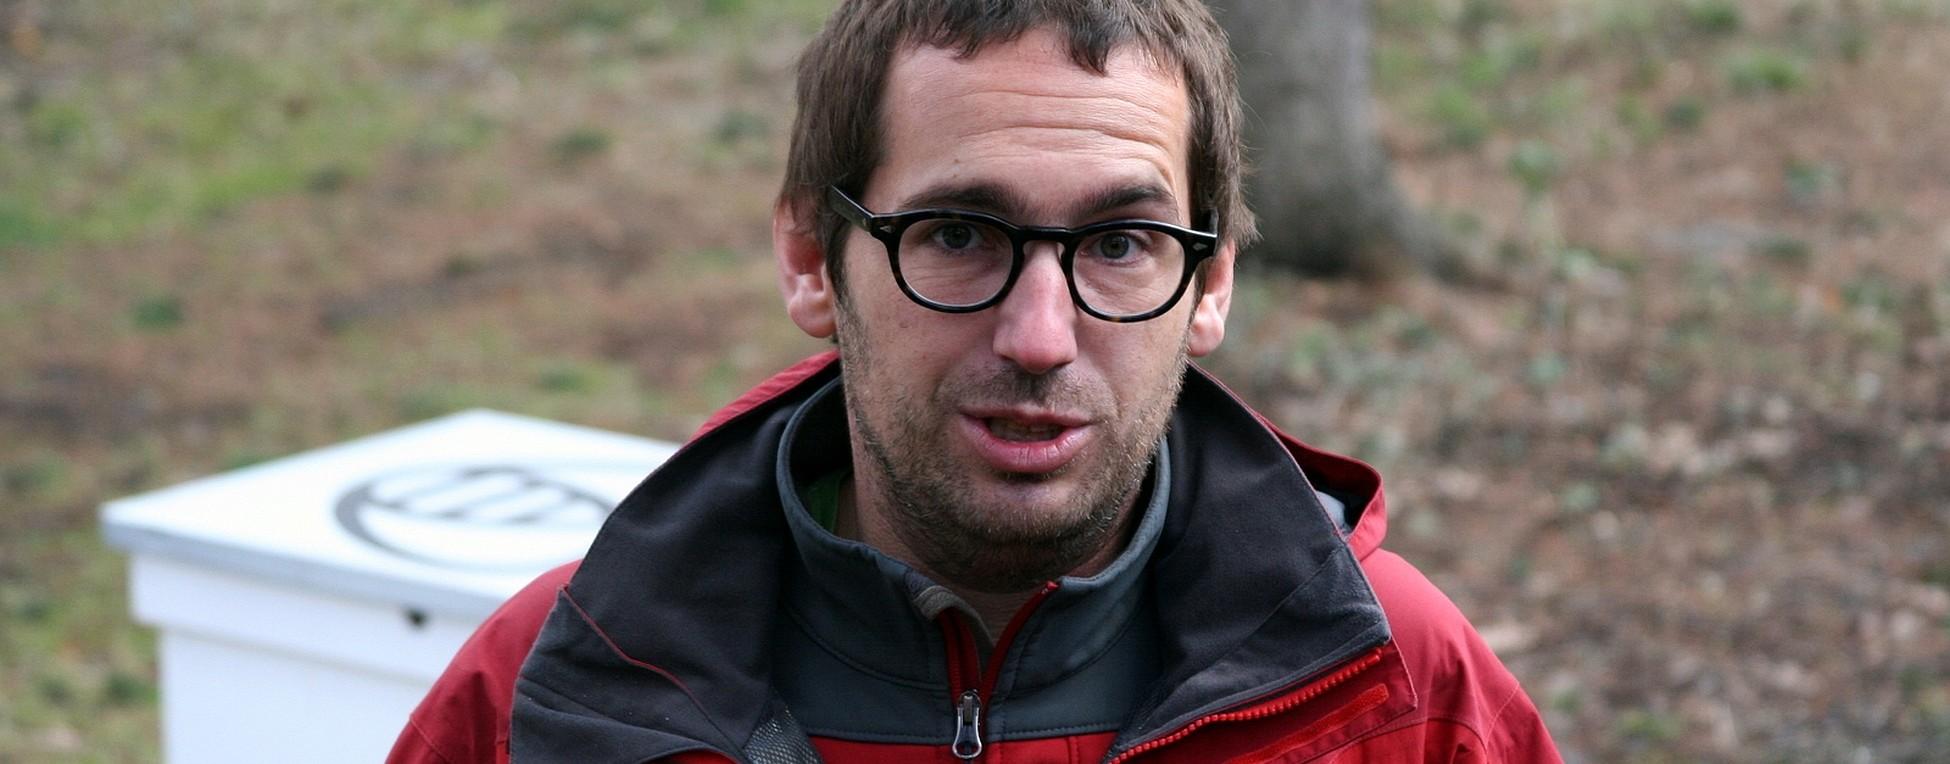 fot. Tadeusz Baranowski